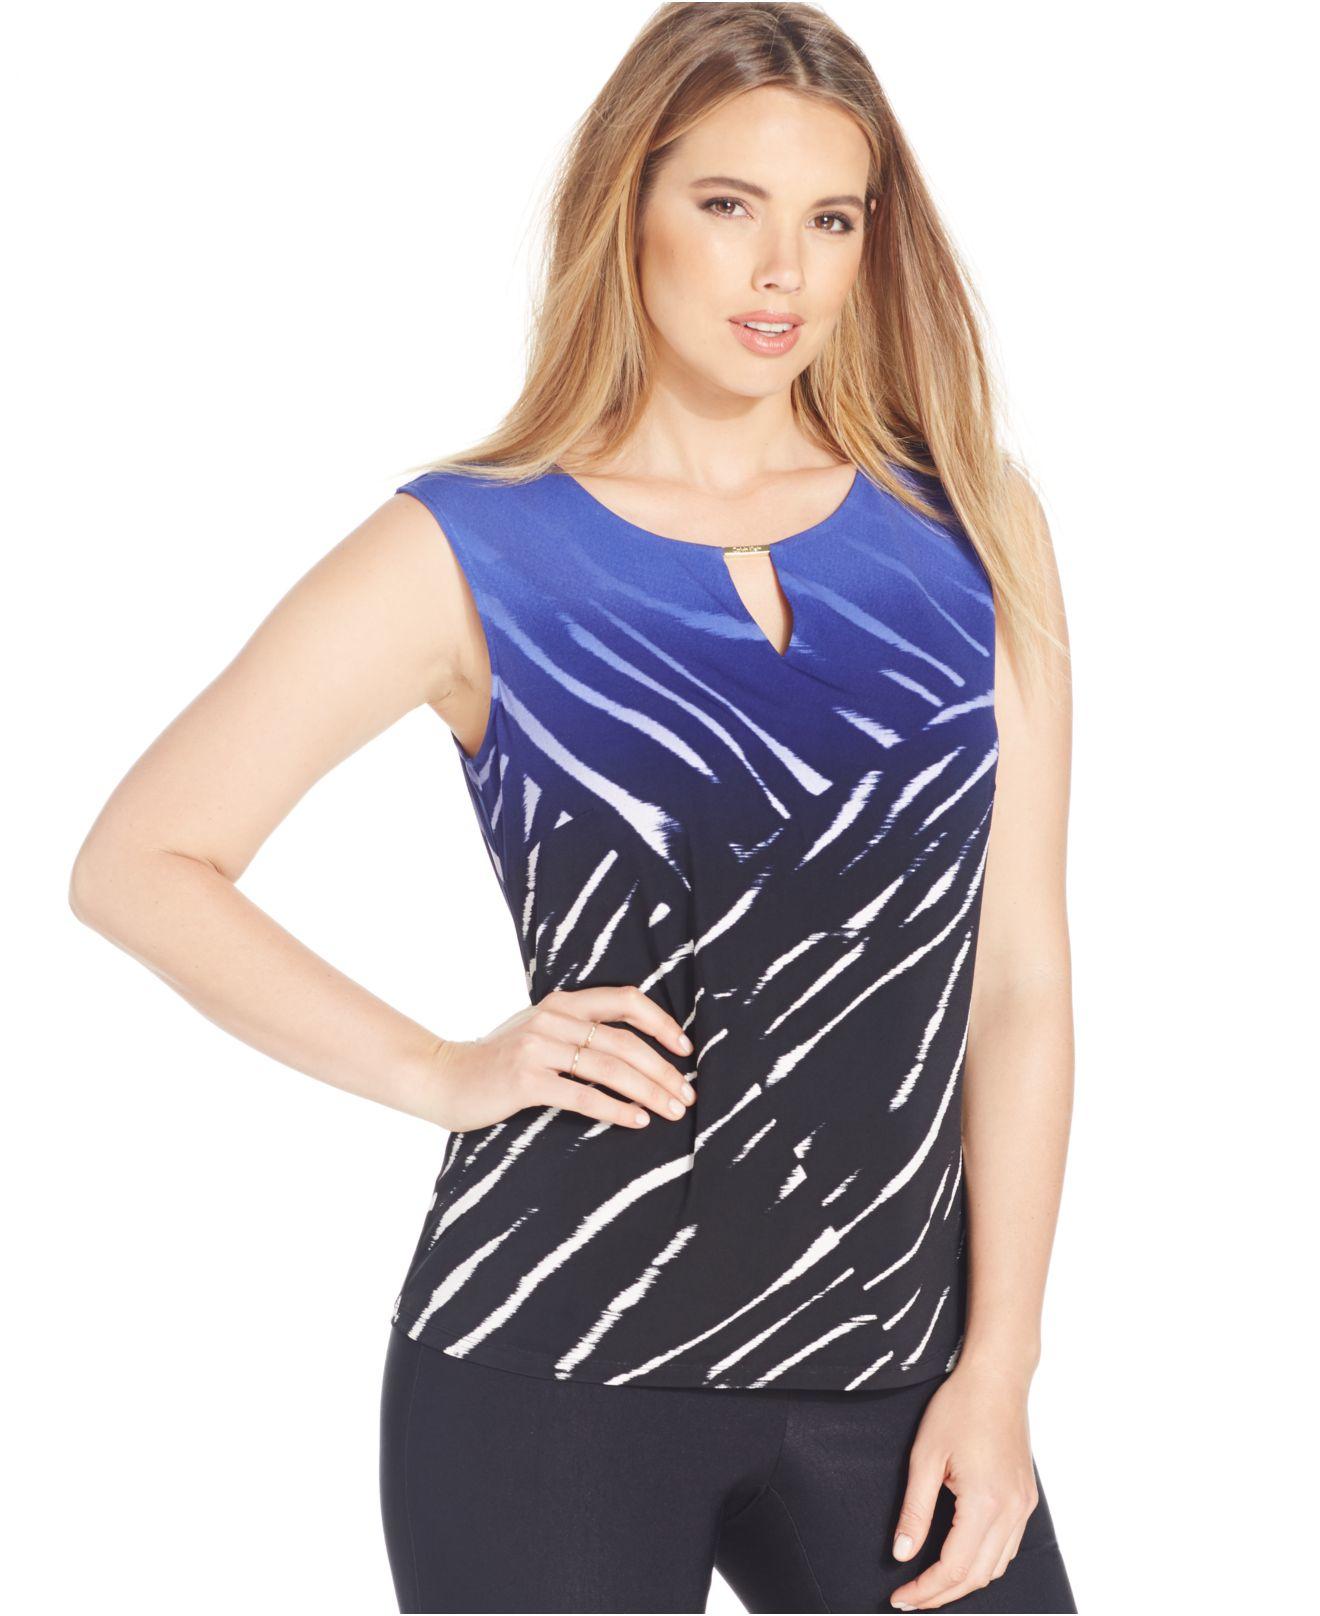 e3a8d7f1280 Lyst - Calvin Klein Plus Size Sleeveless Blouse in Blue